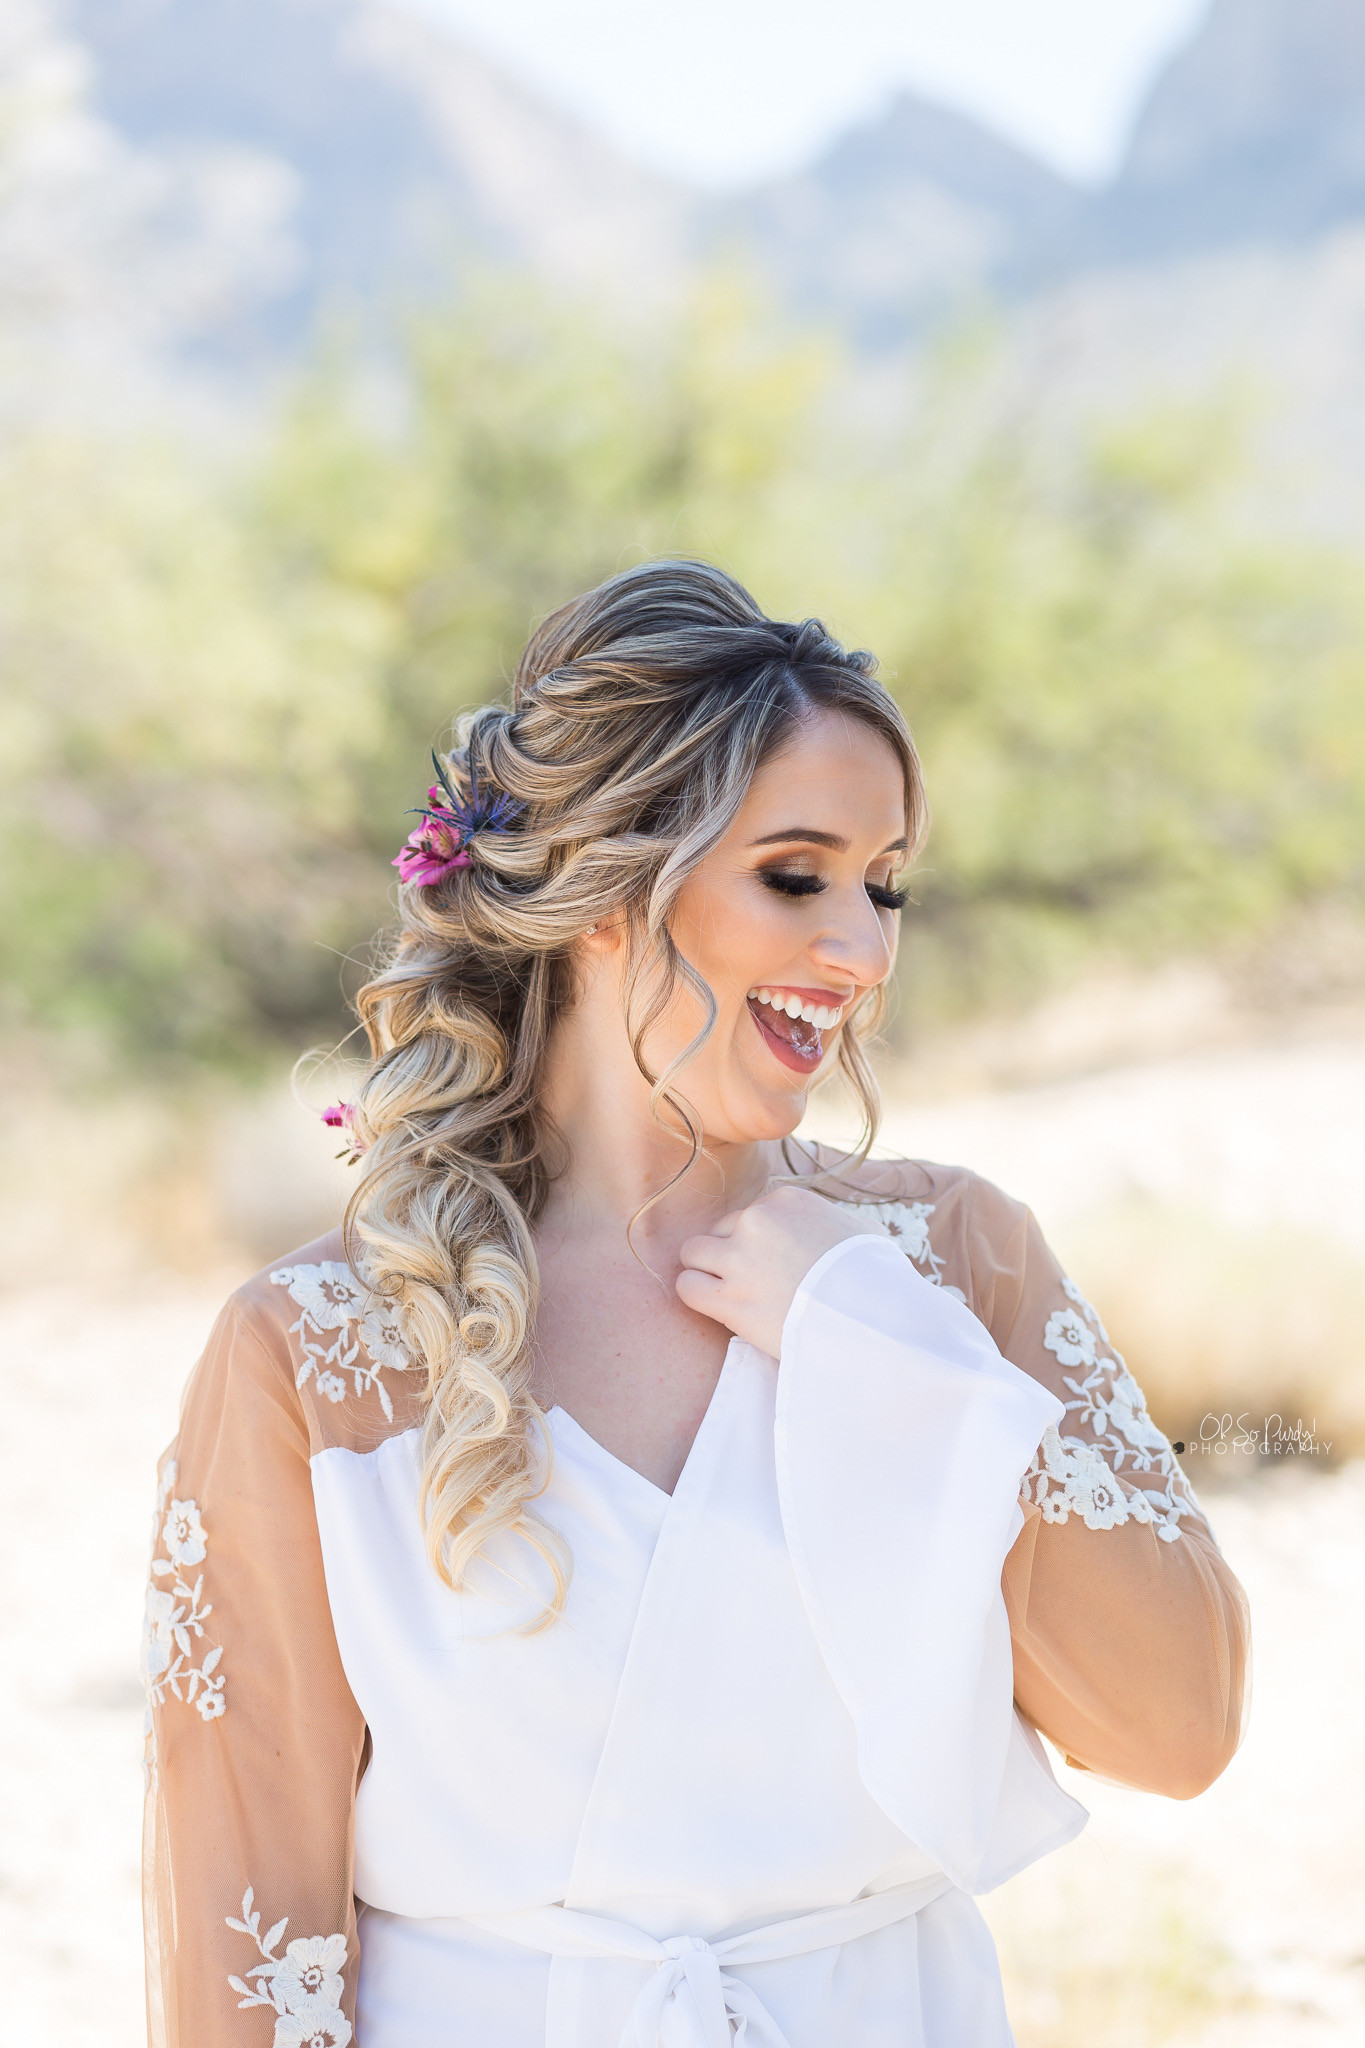 Luxury Bridal Lash Extensions